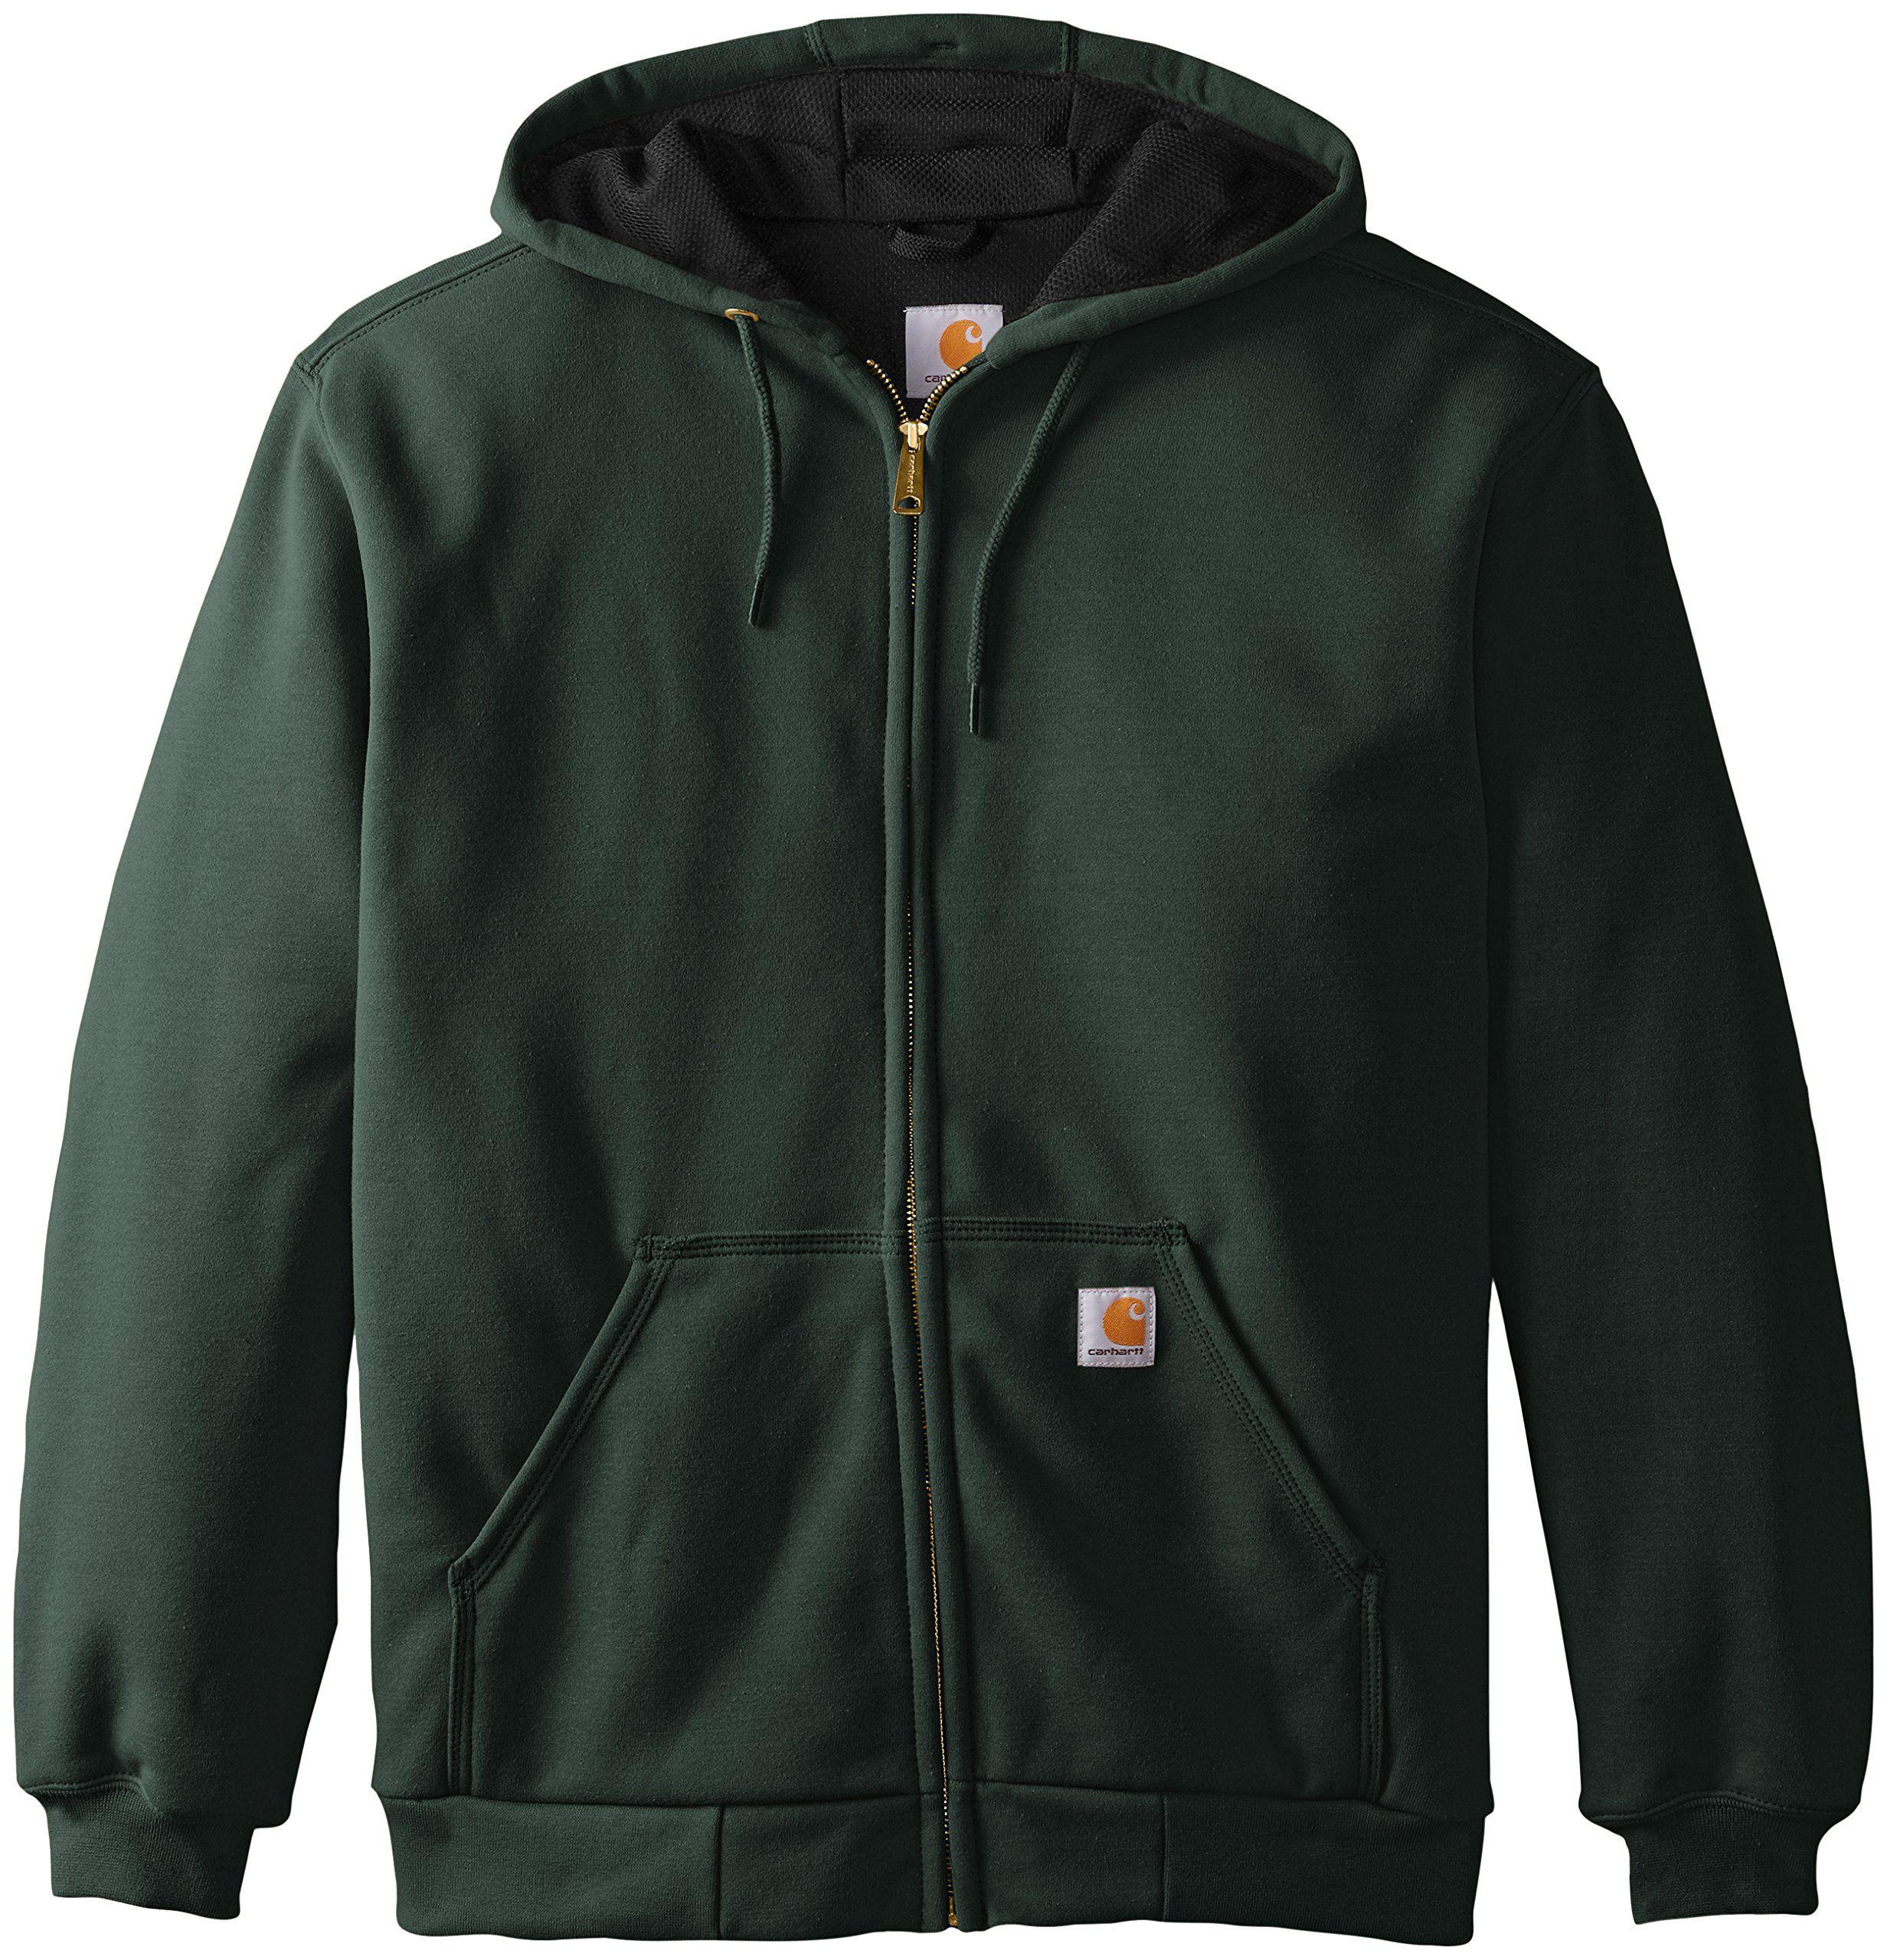 Carhartt Mens Rain Defender Rutland Thermal Lined Hooded Zip Front Sweatshirt Canopy Green Large See This Hoodies Men Style Black Sweatshirts Carhartt Mens [ 2560 x 2464 Pixel ]